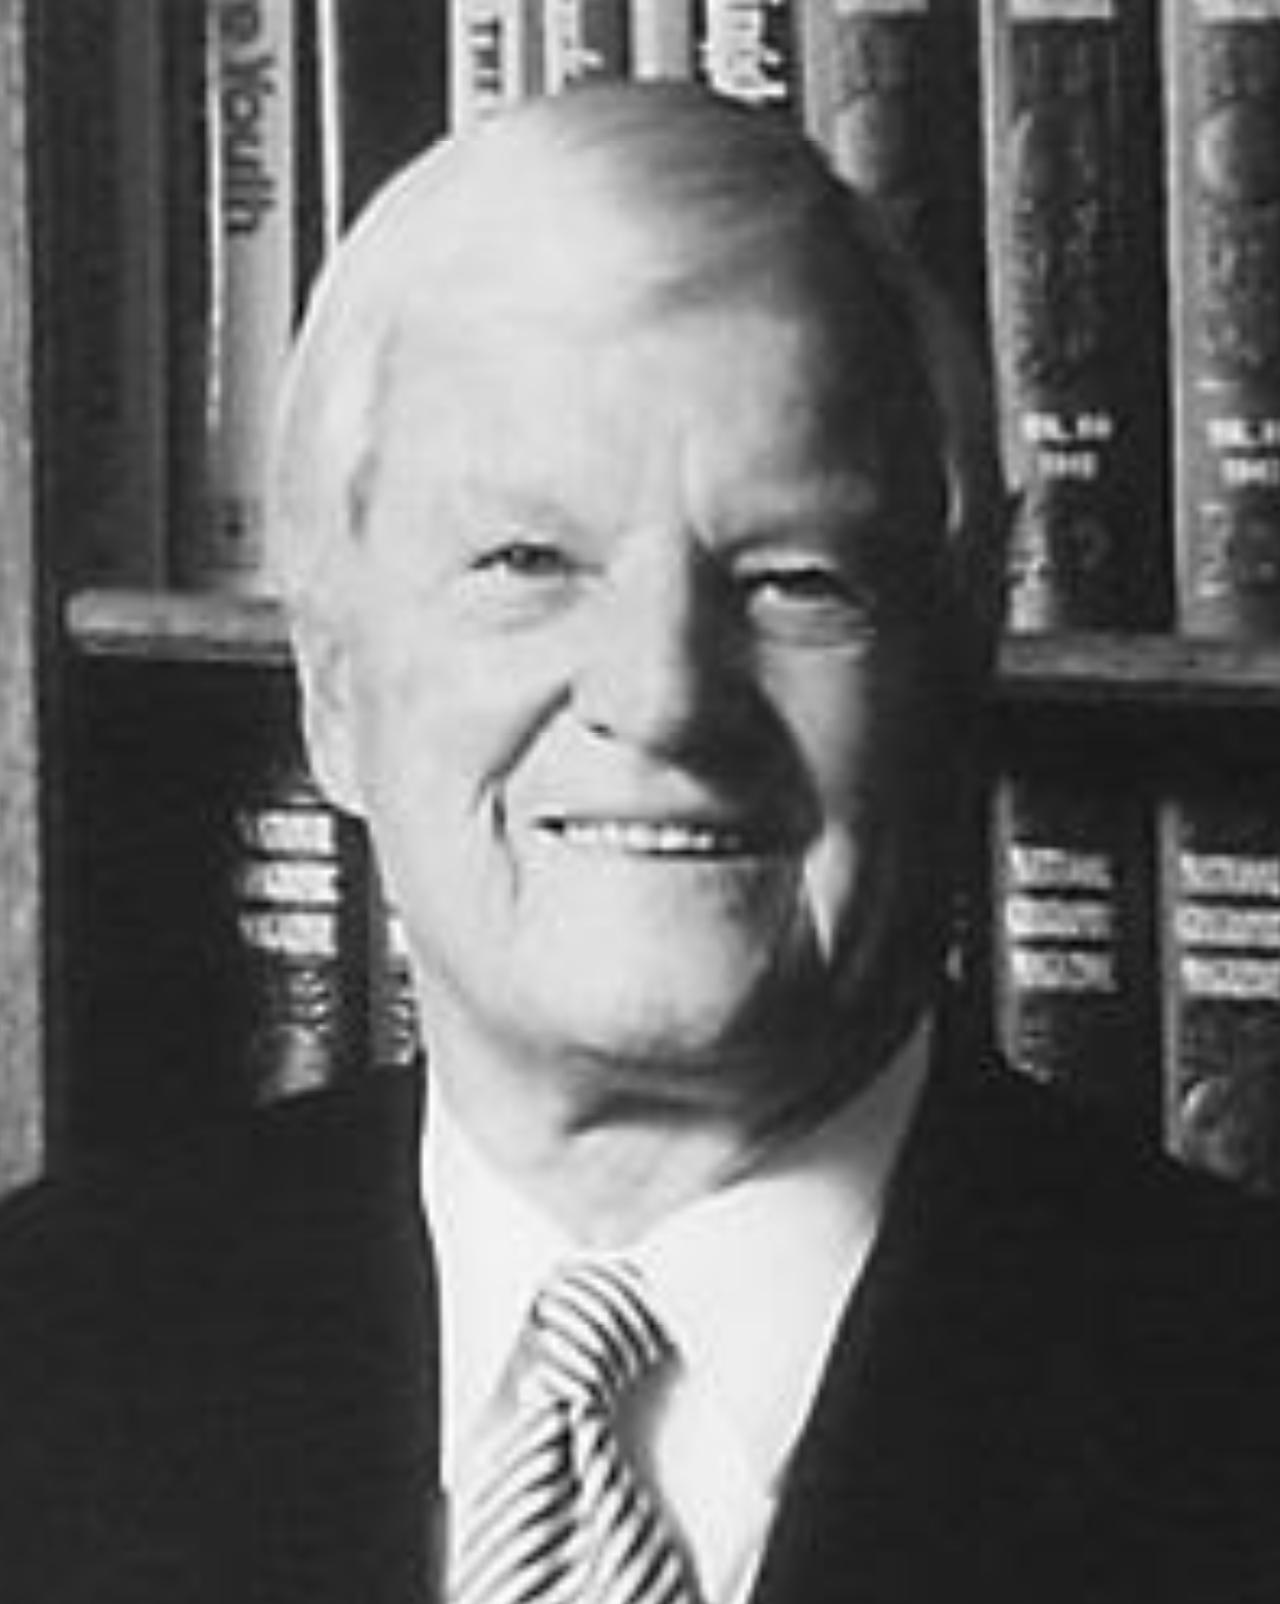 J. HARRIS GALLOWAY